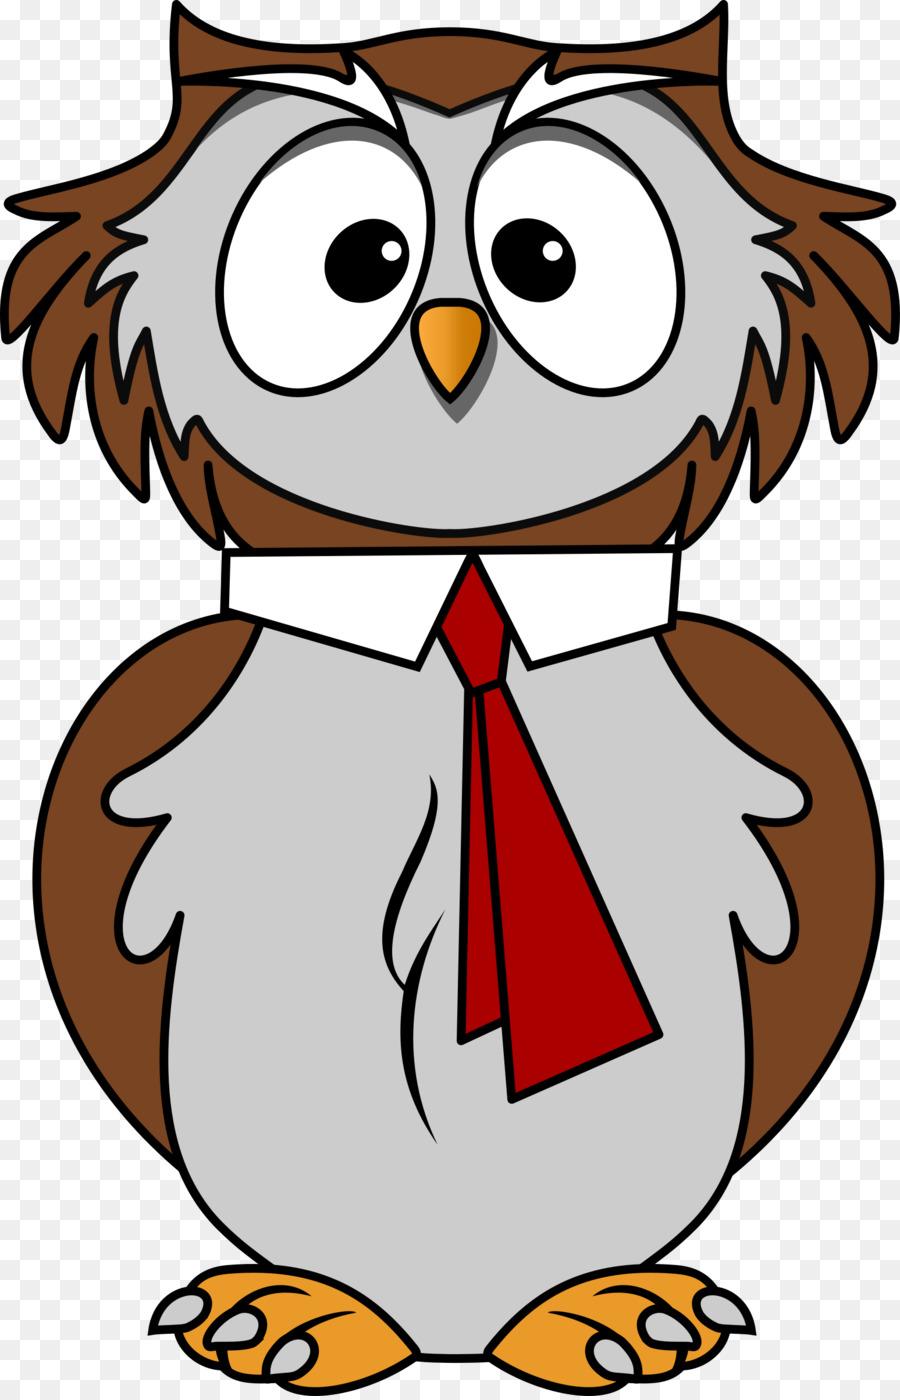 Owl Cartoontransparent png image & clipart free download.